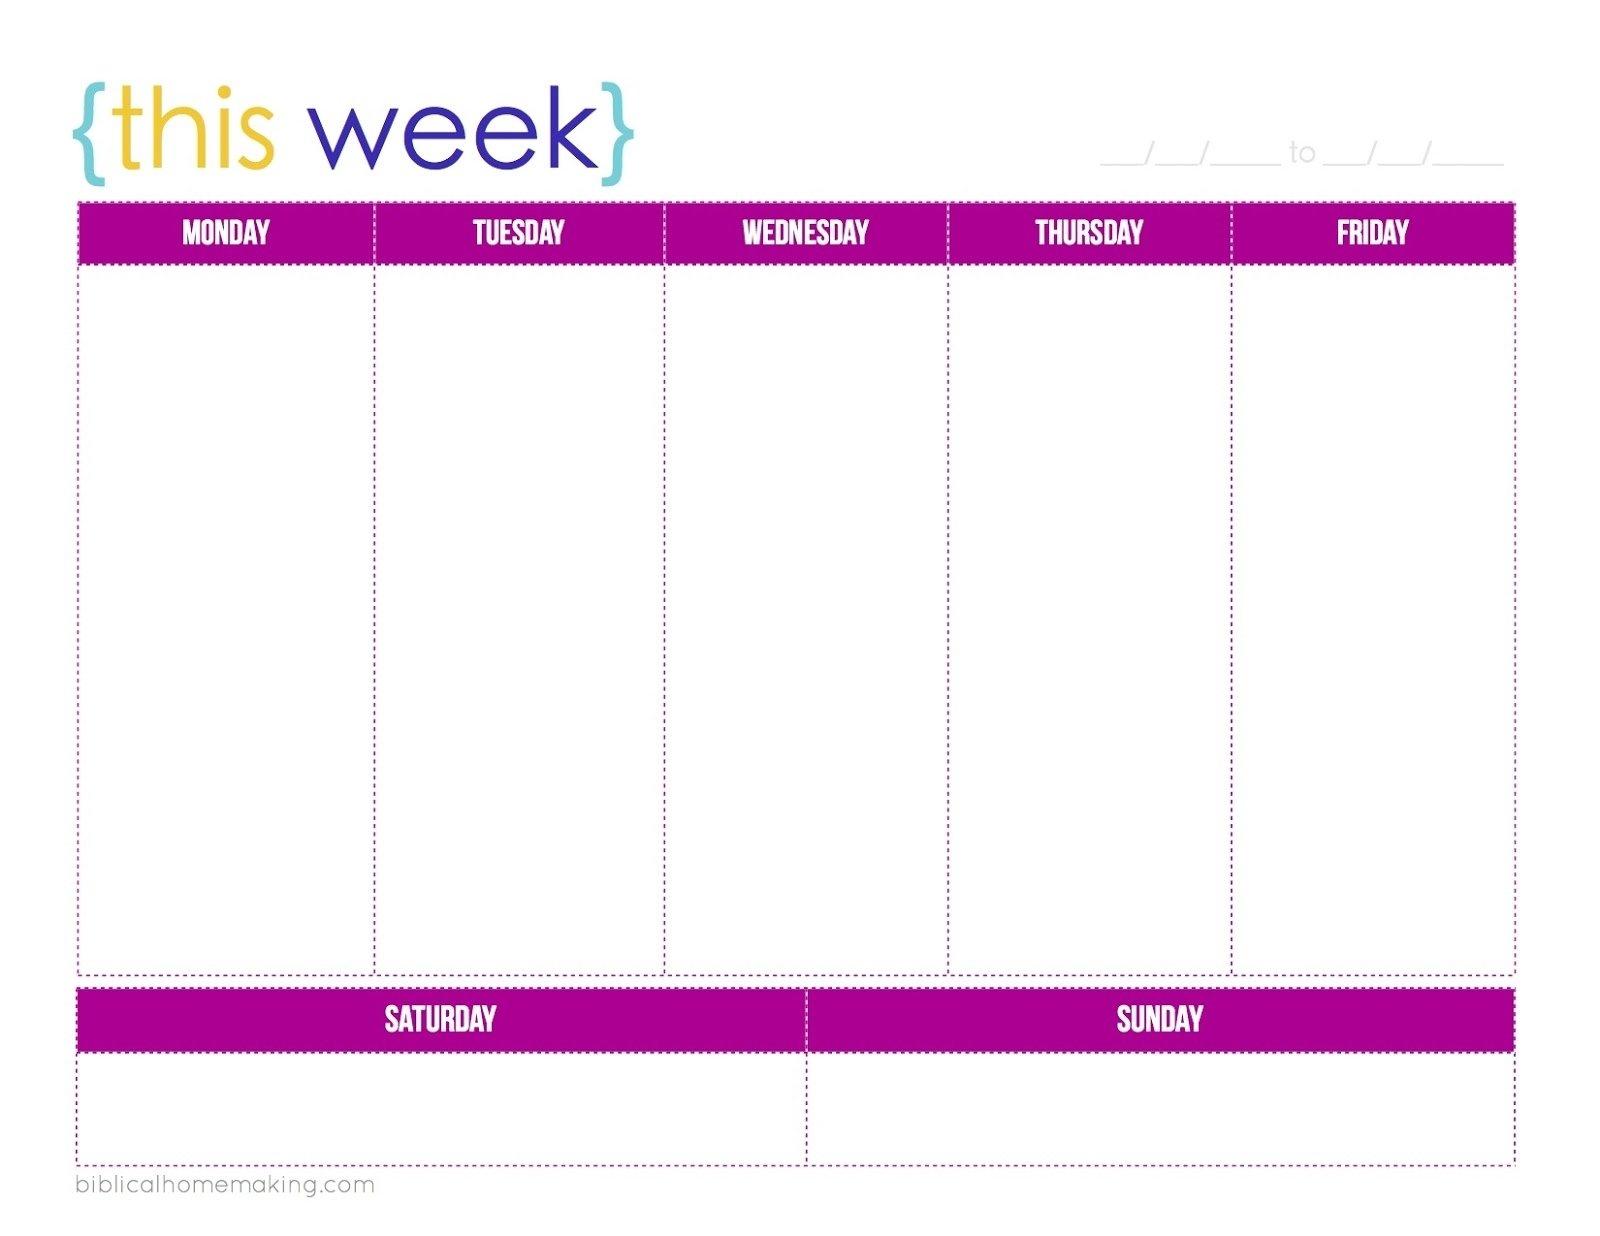 Free Printable M-F Calendar | Ten Free Printable Calendar Mon - Fri Calender Layout Download